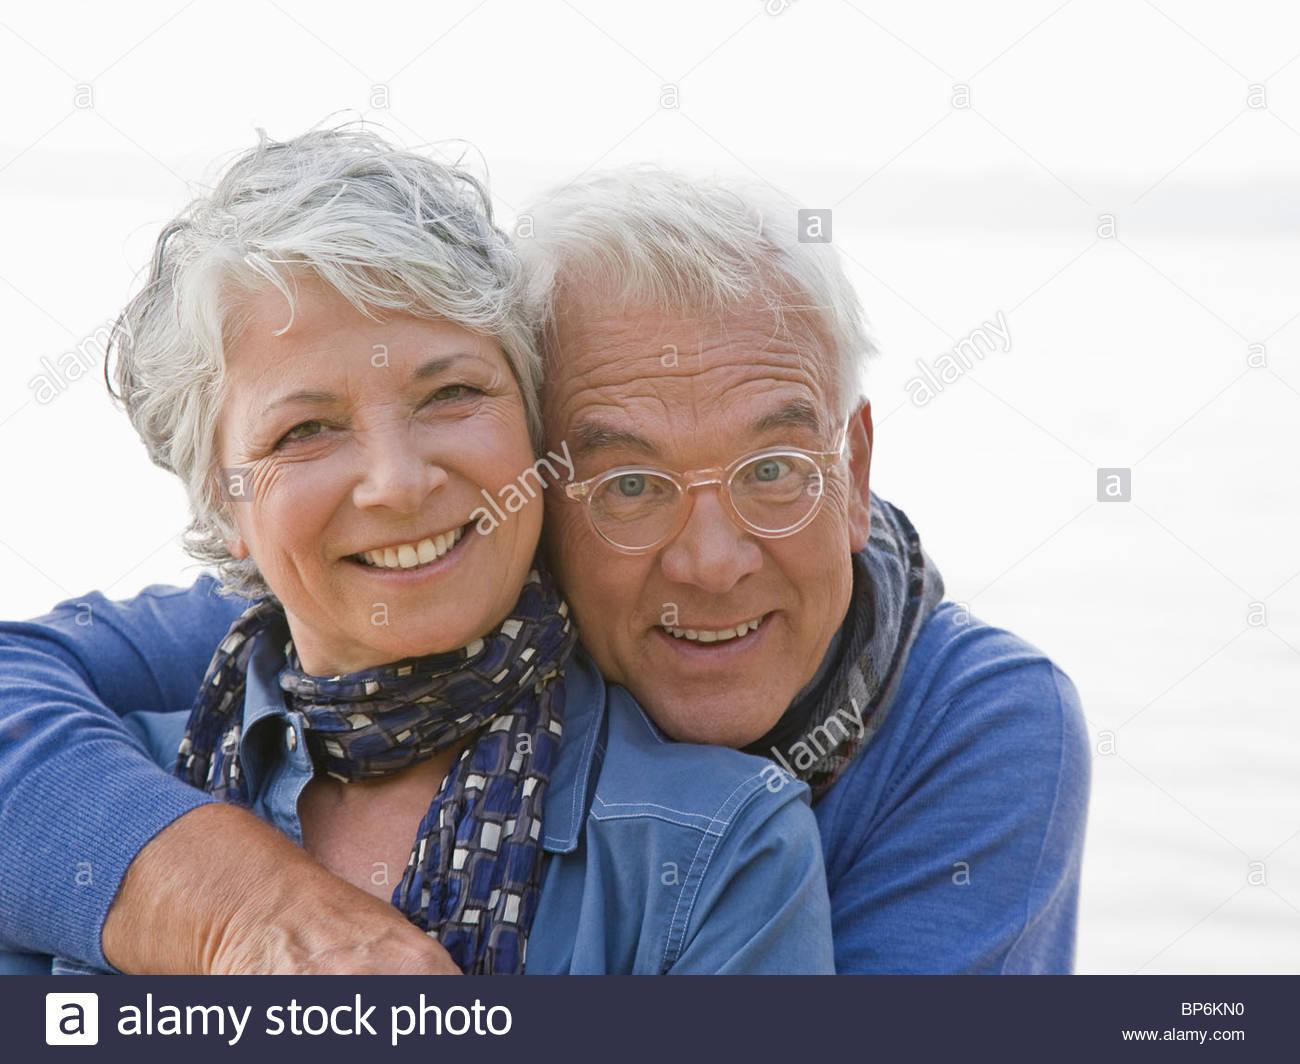 Colorado Ukrainian Senior Online Dating Site